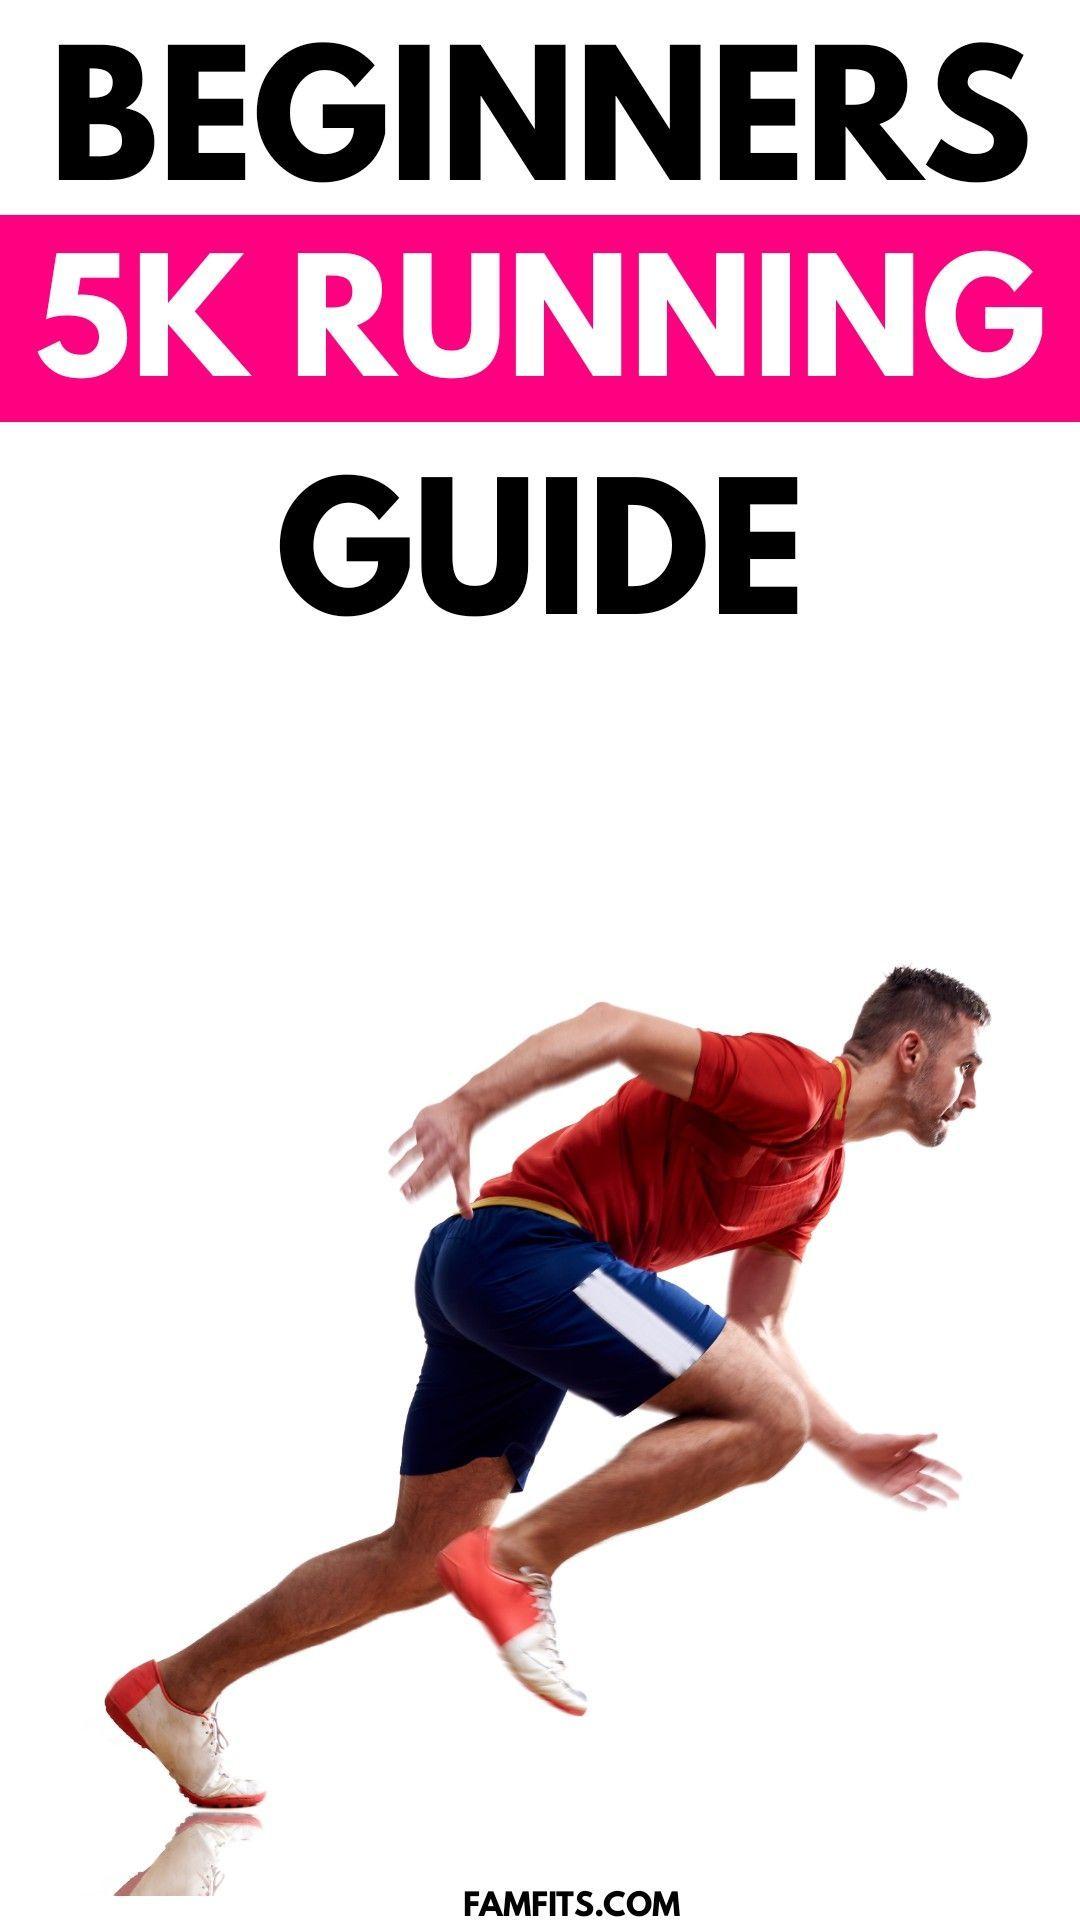 Beginners 5k Running Guide In